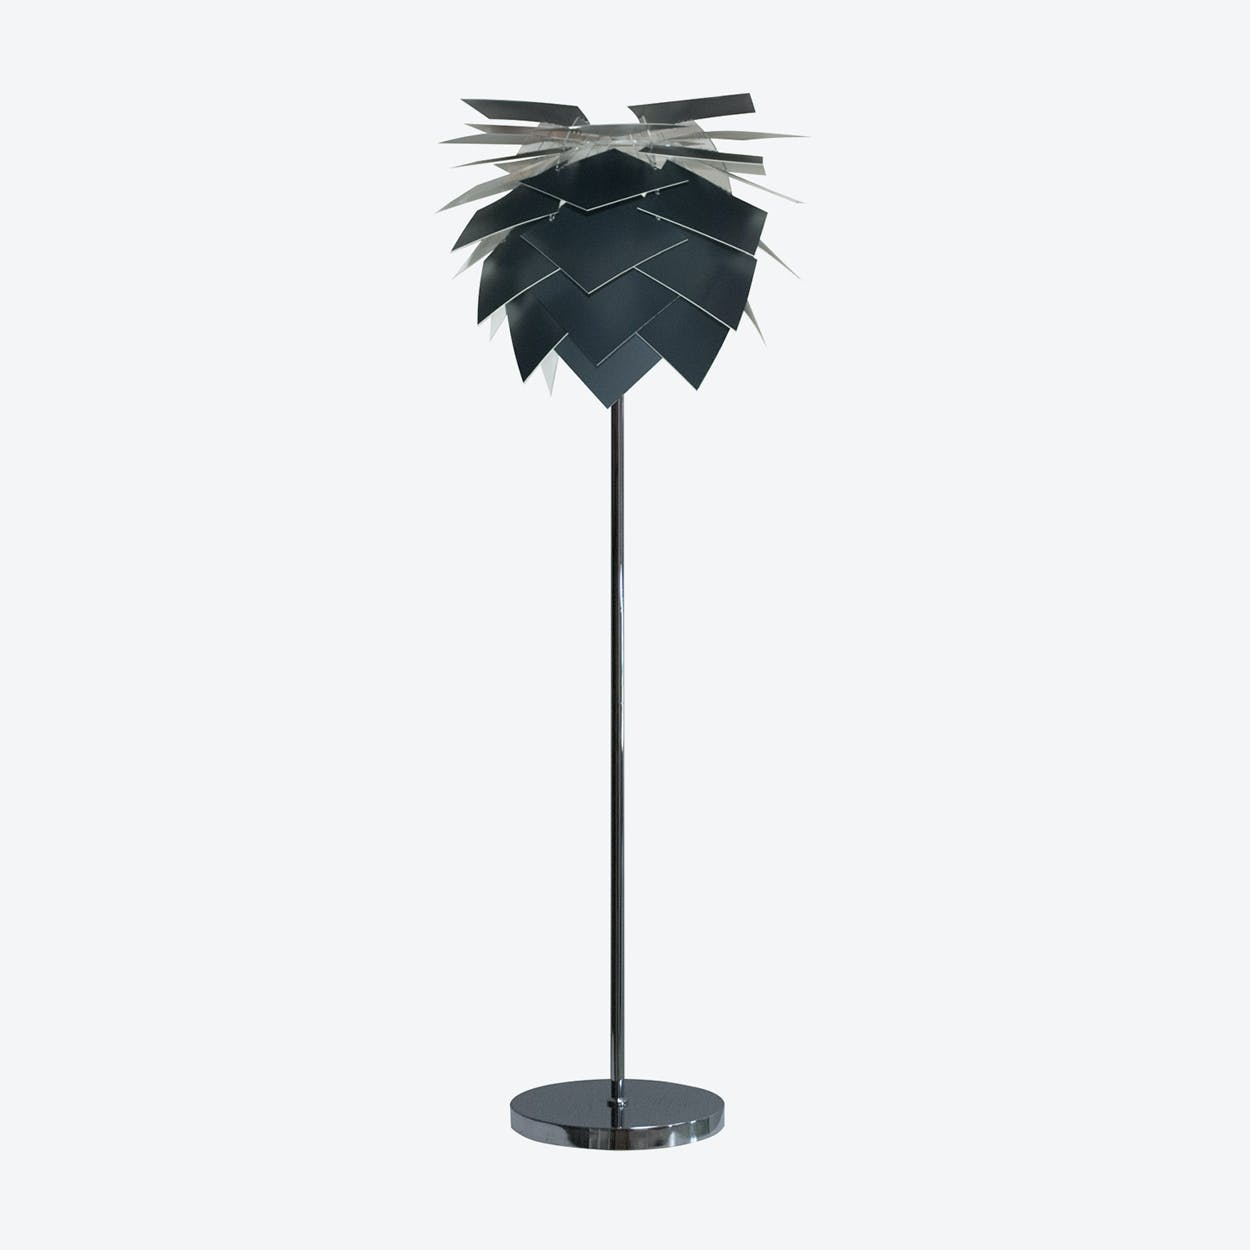 Special Edition Medium Black Anthracite Grey PineApple Floor Lamp in Matte Satin Finish